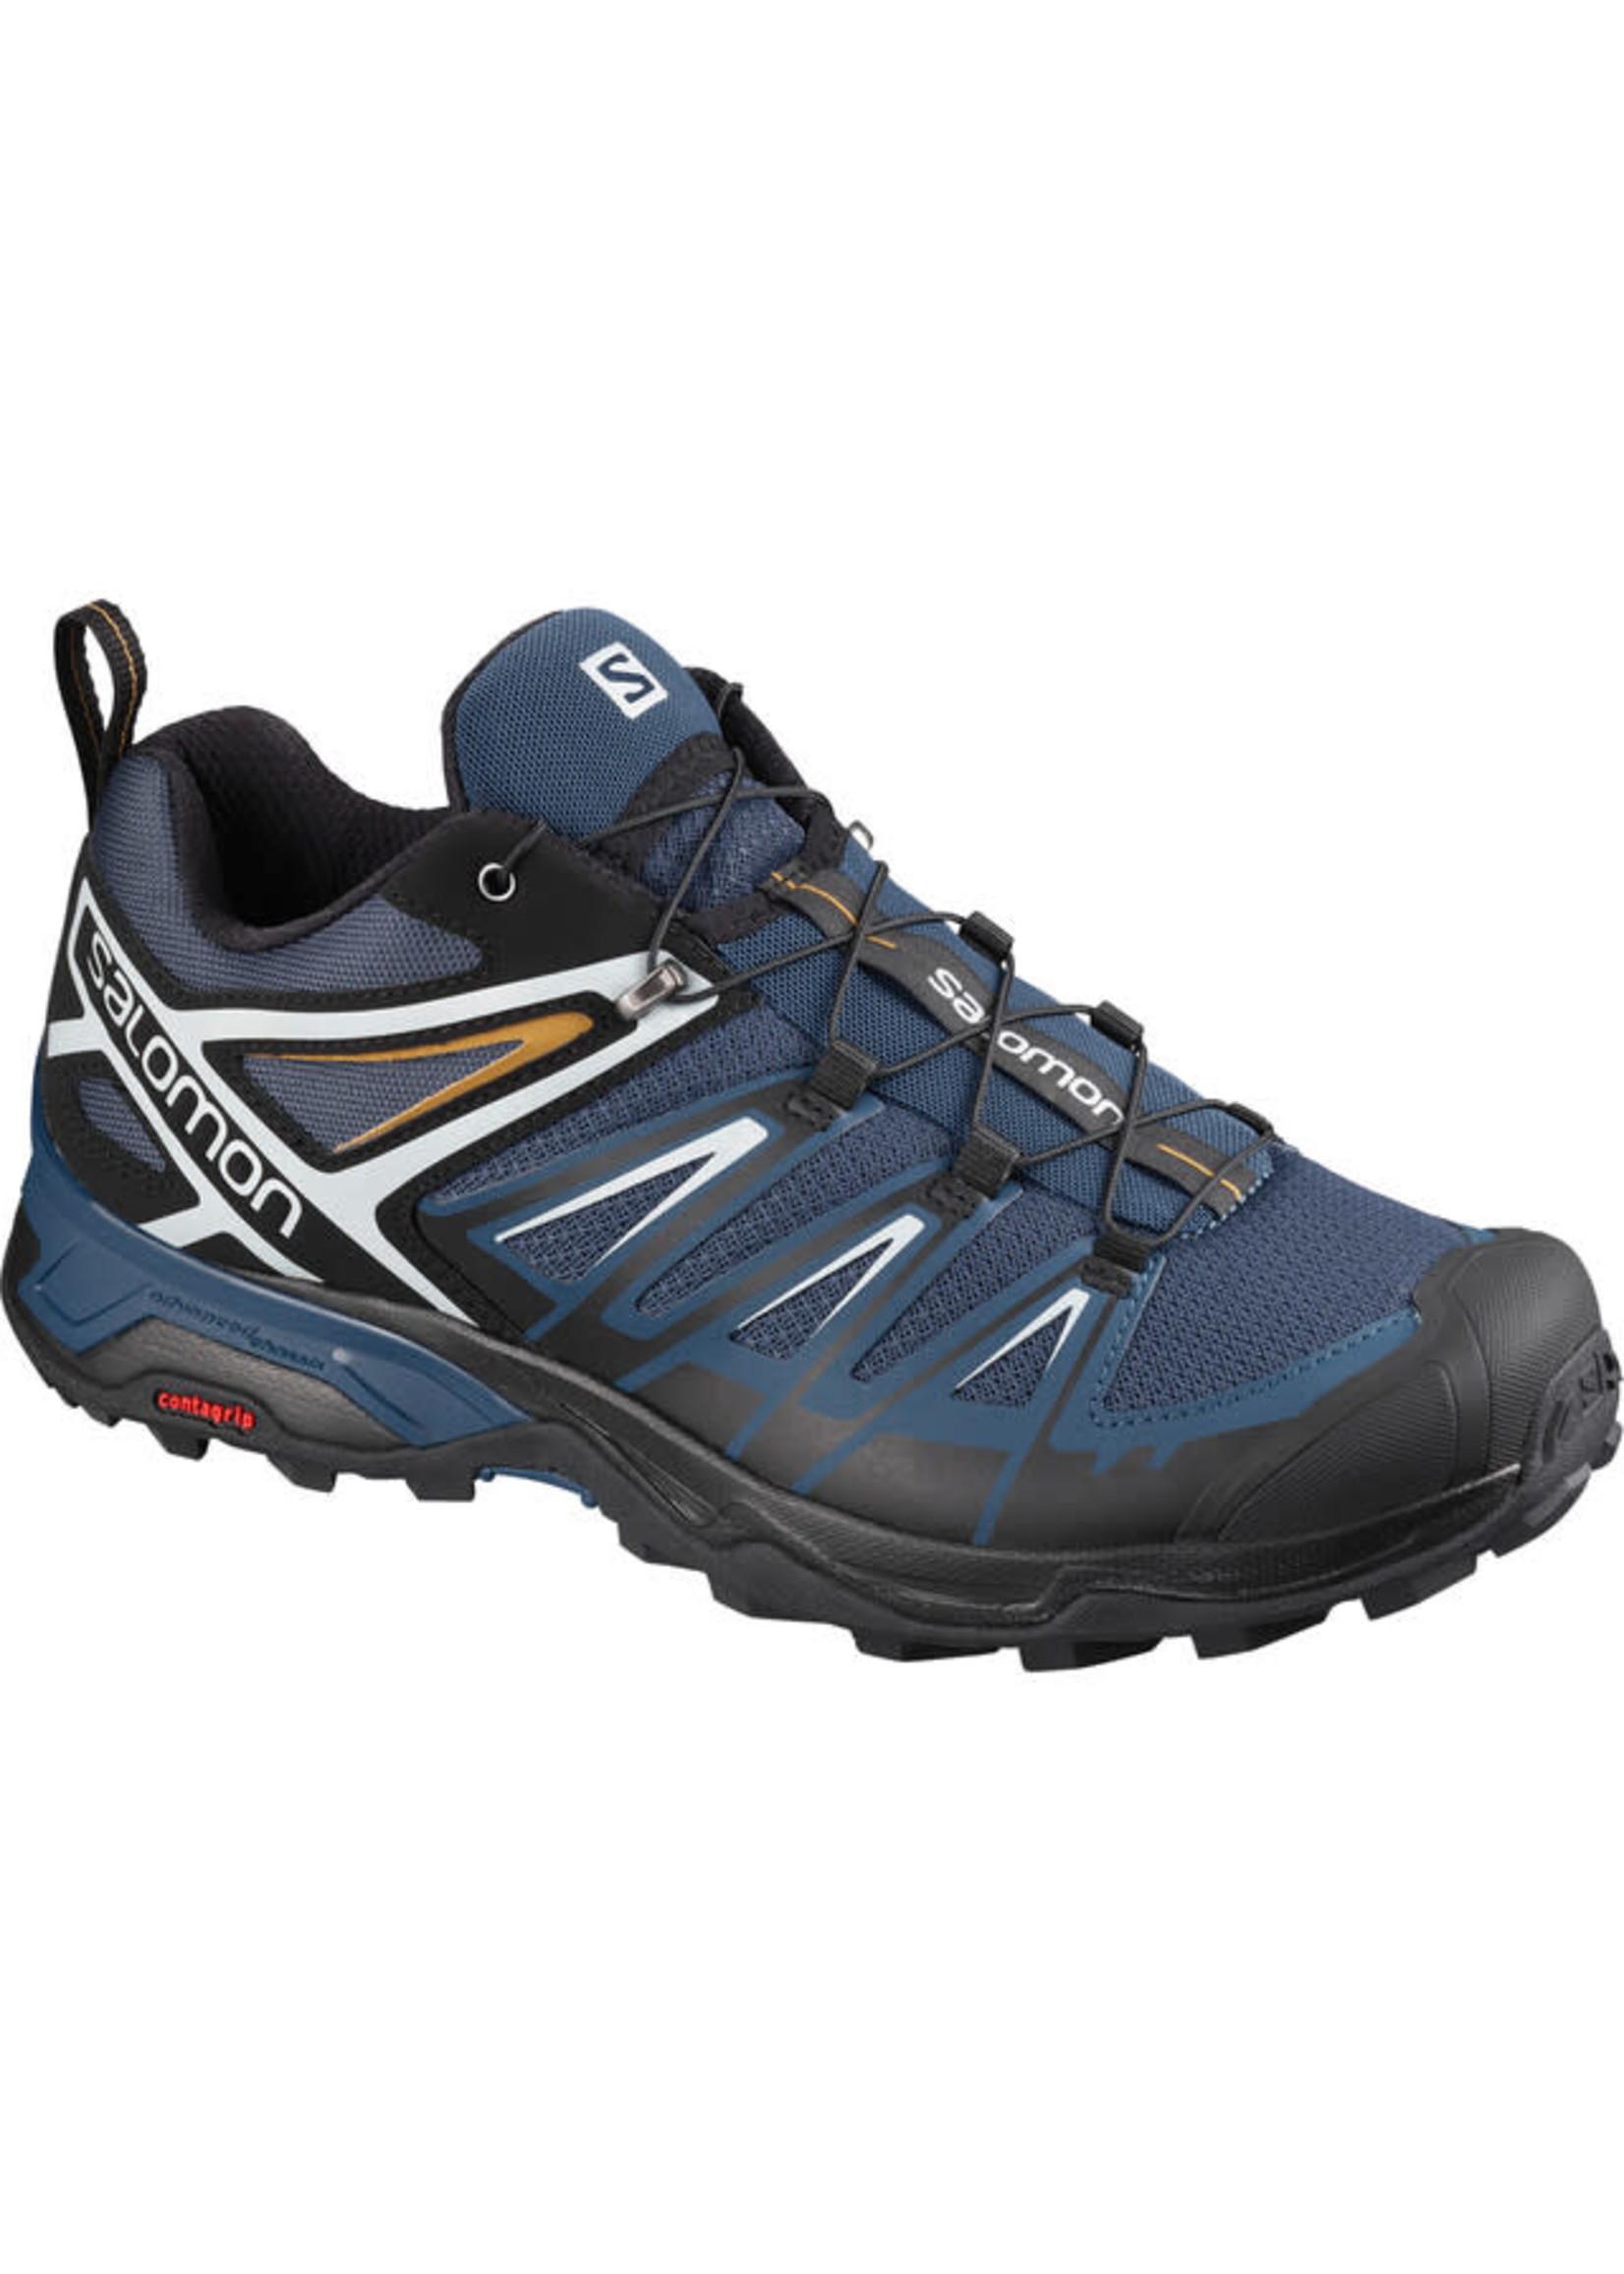 Salomon Salomon X Ultra 3 GTX Mens Walking Shoe (2021)